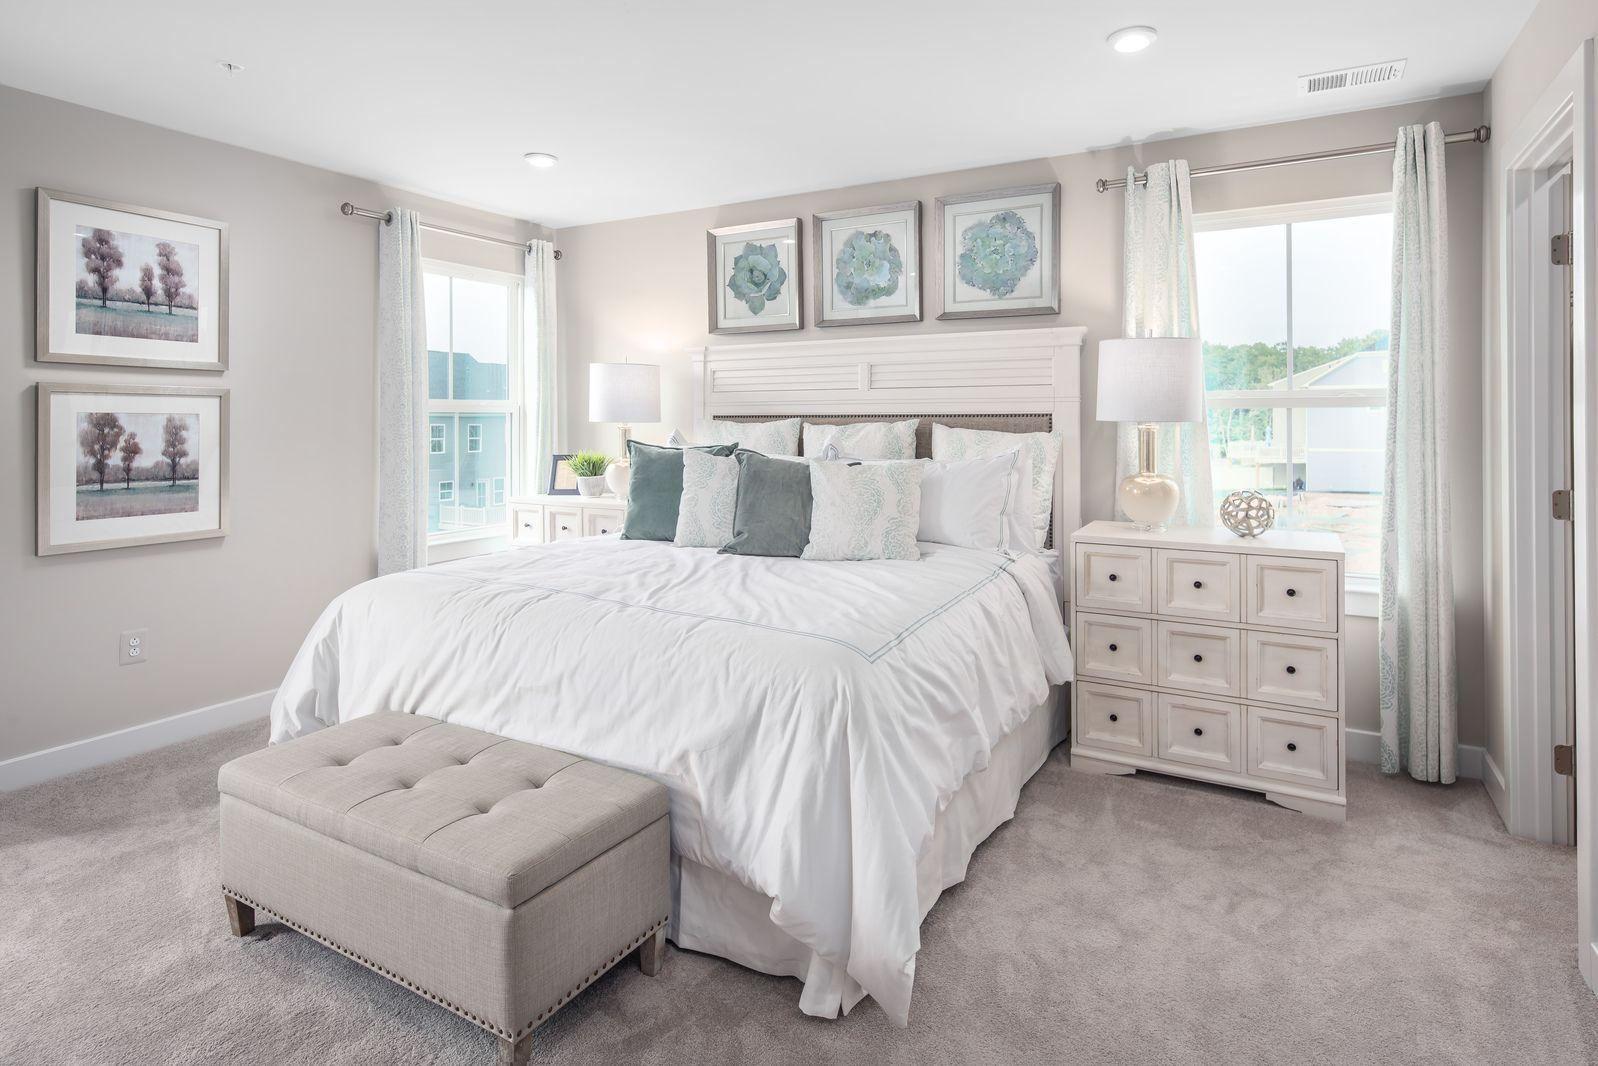 Bedroom featured in the Ballenger By HeartlandHomes in Morgantown, WV